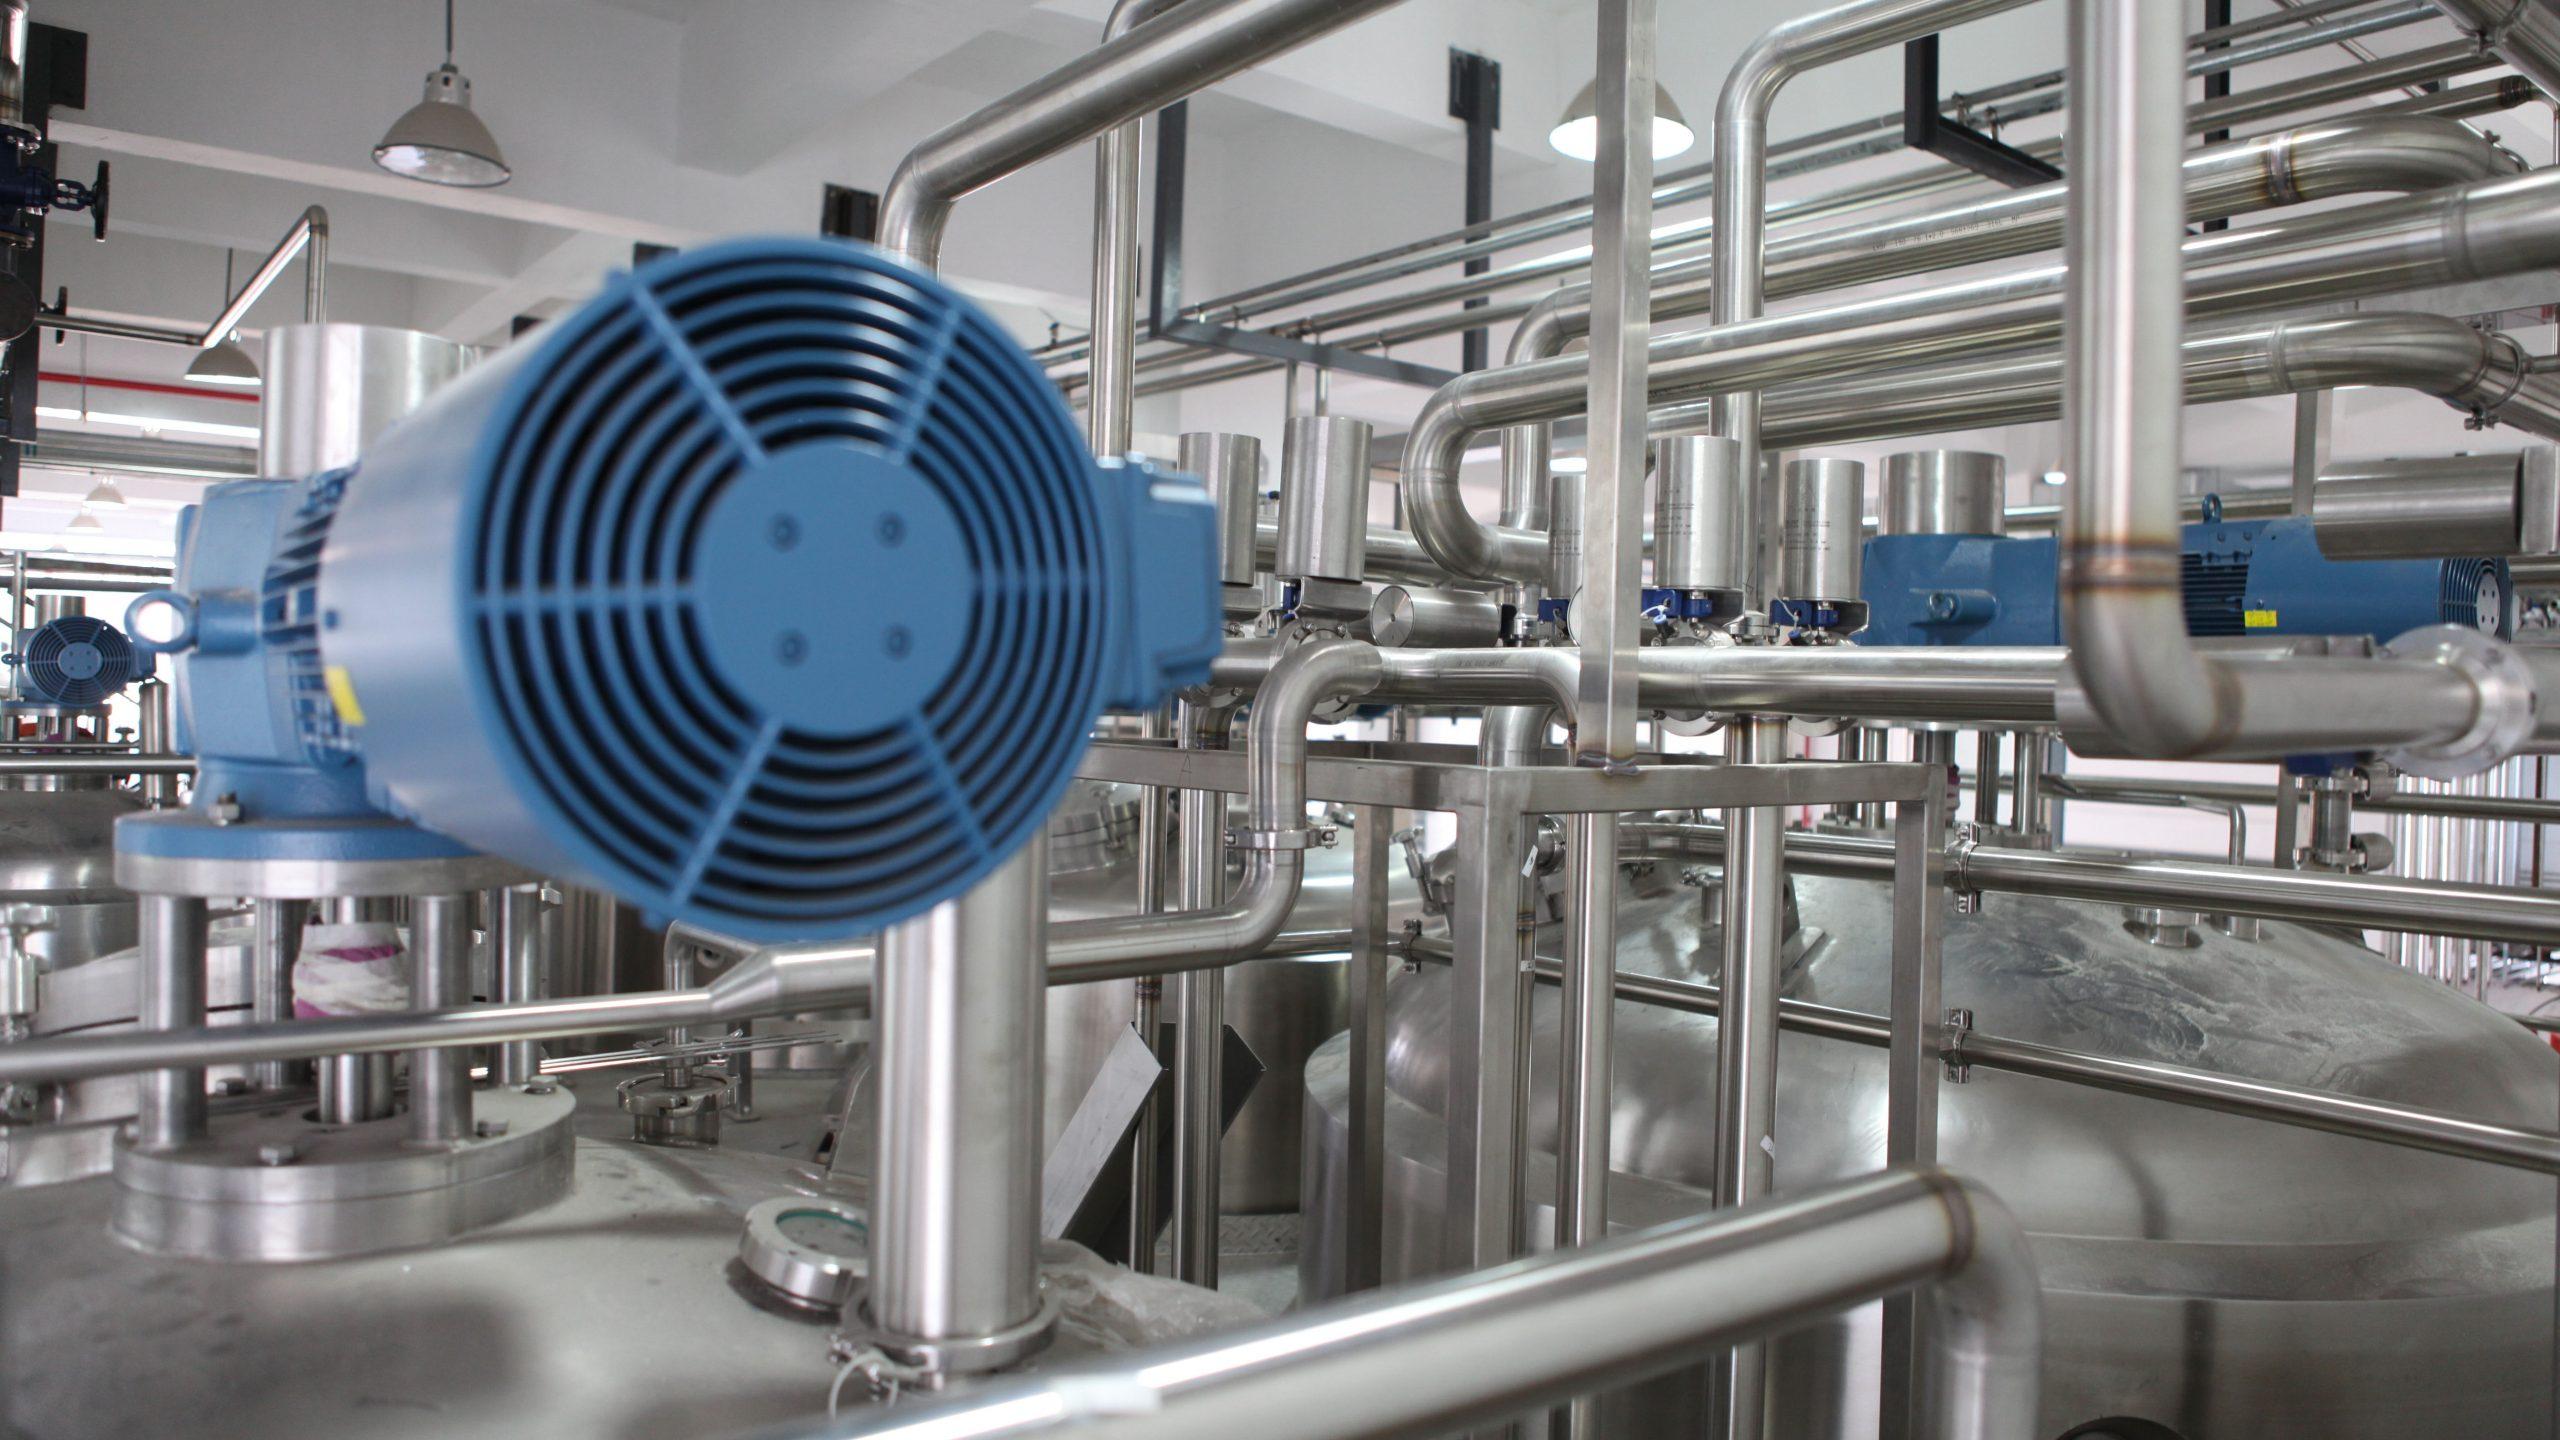 acadia refrigeration - compressor rink